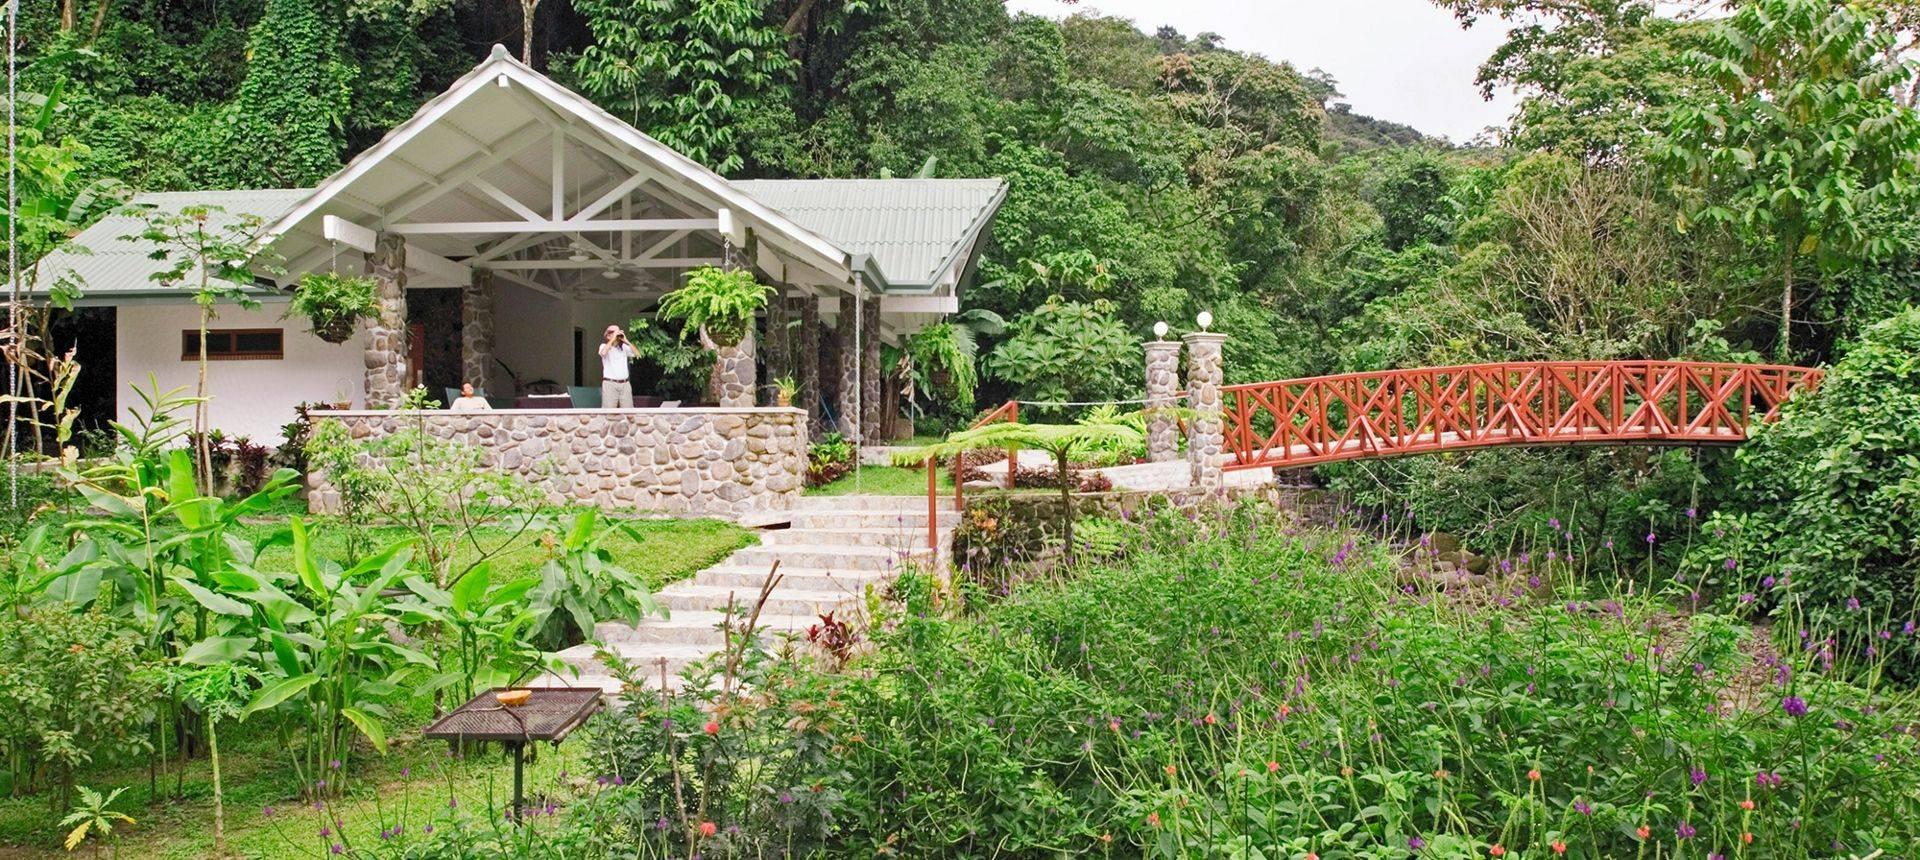 Canopy Lodge David Tipling